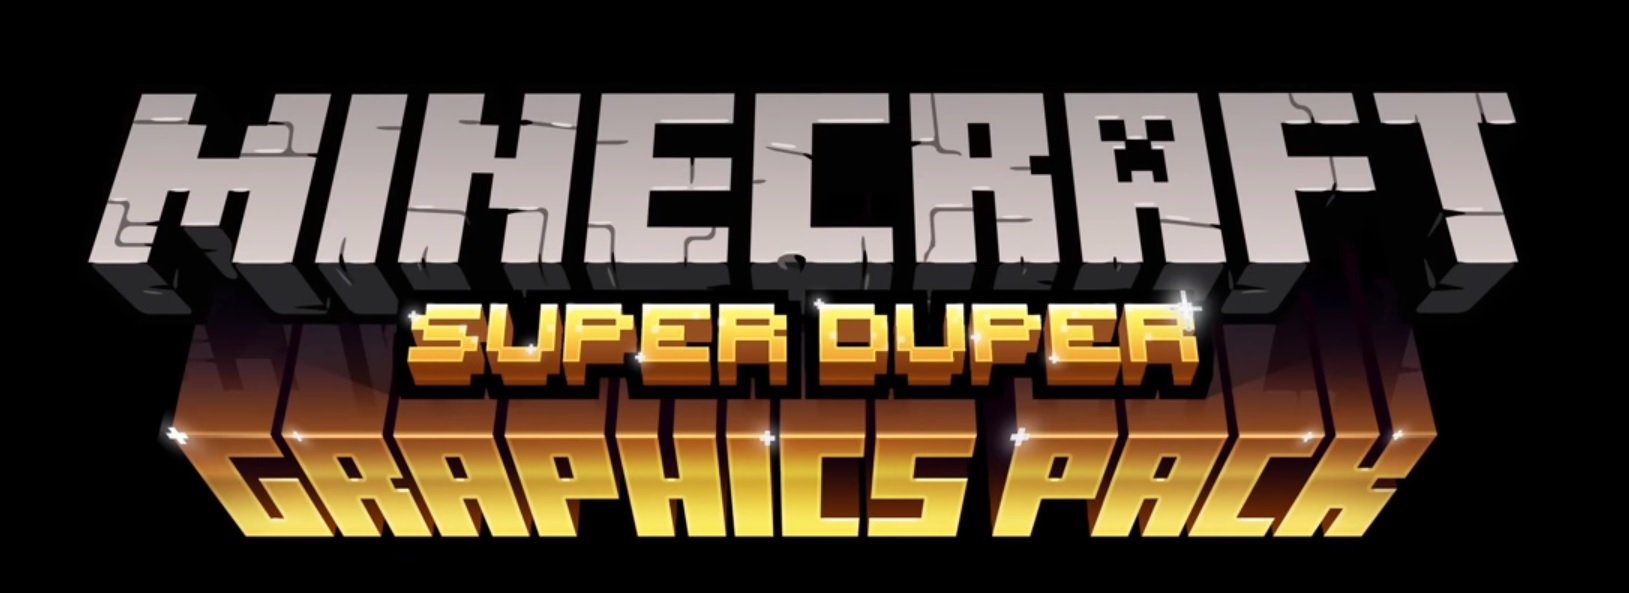 super duper graphics pack logo